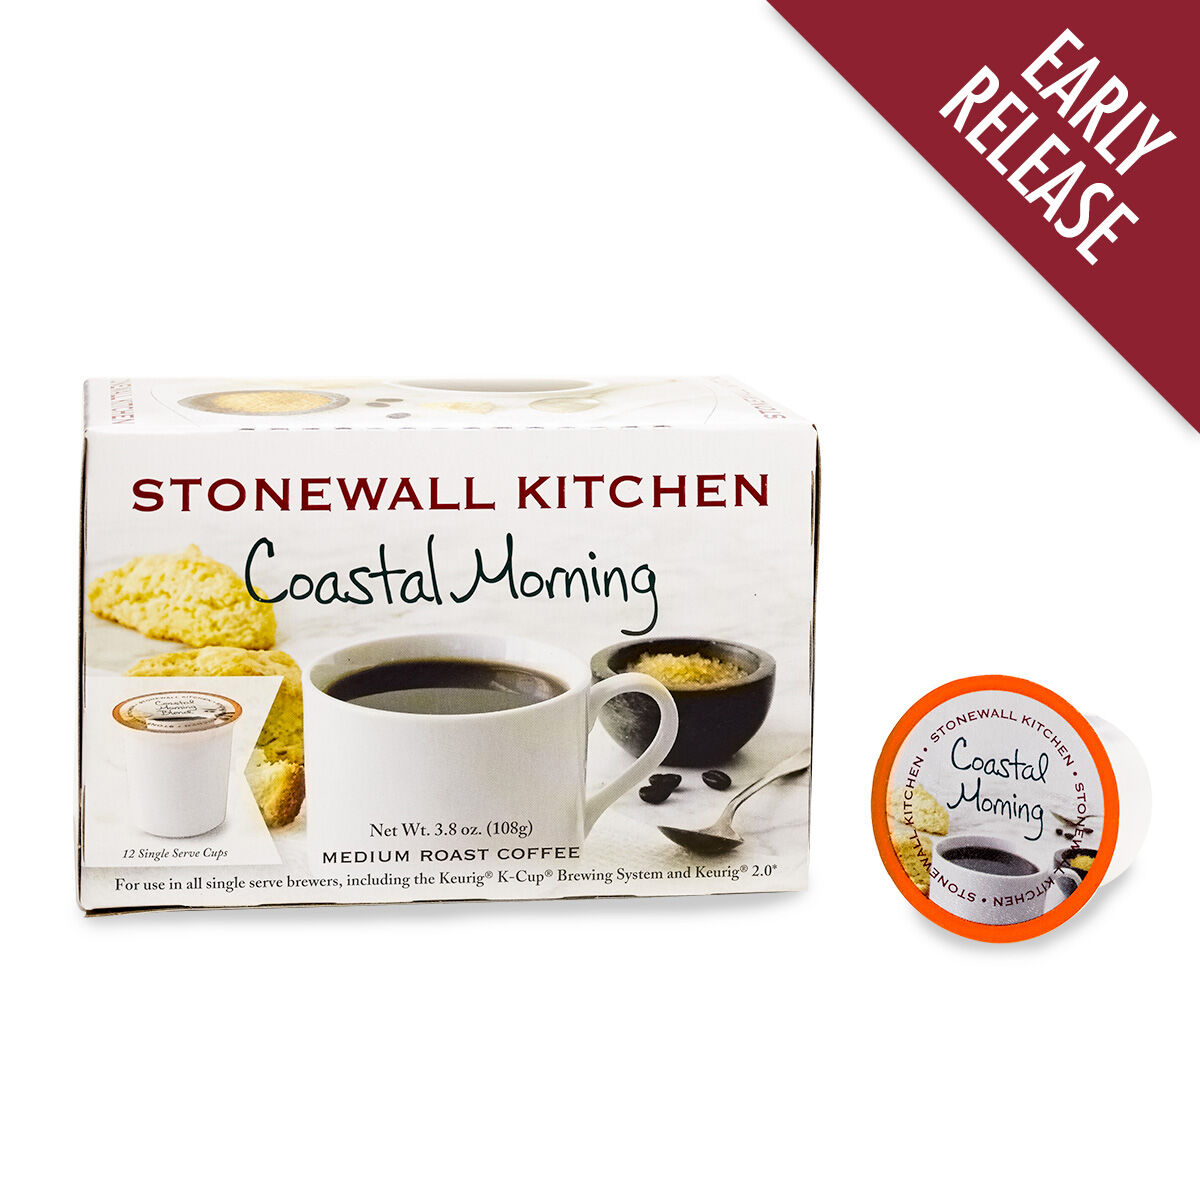 Stonewall kitchen coupon code free shipping  Printable